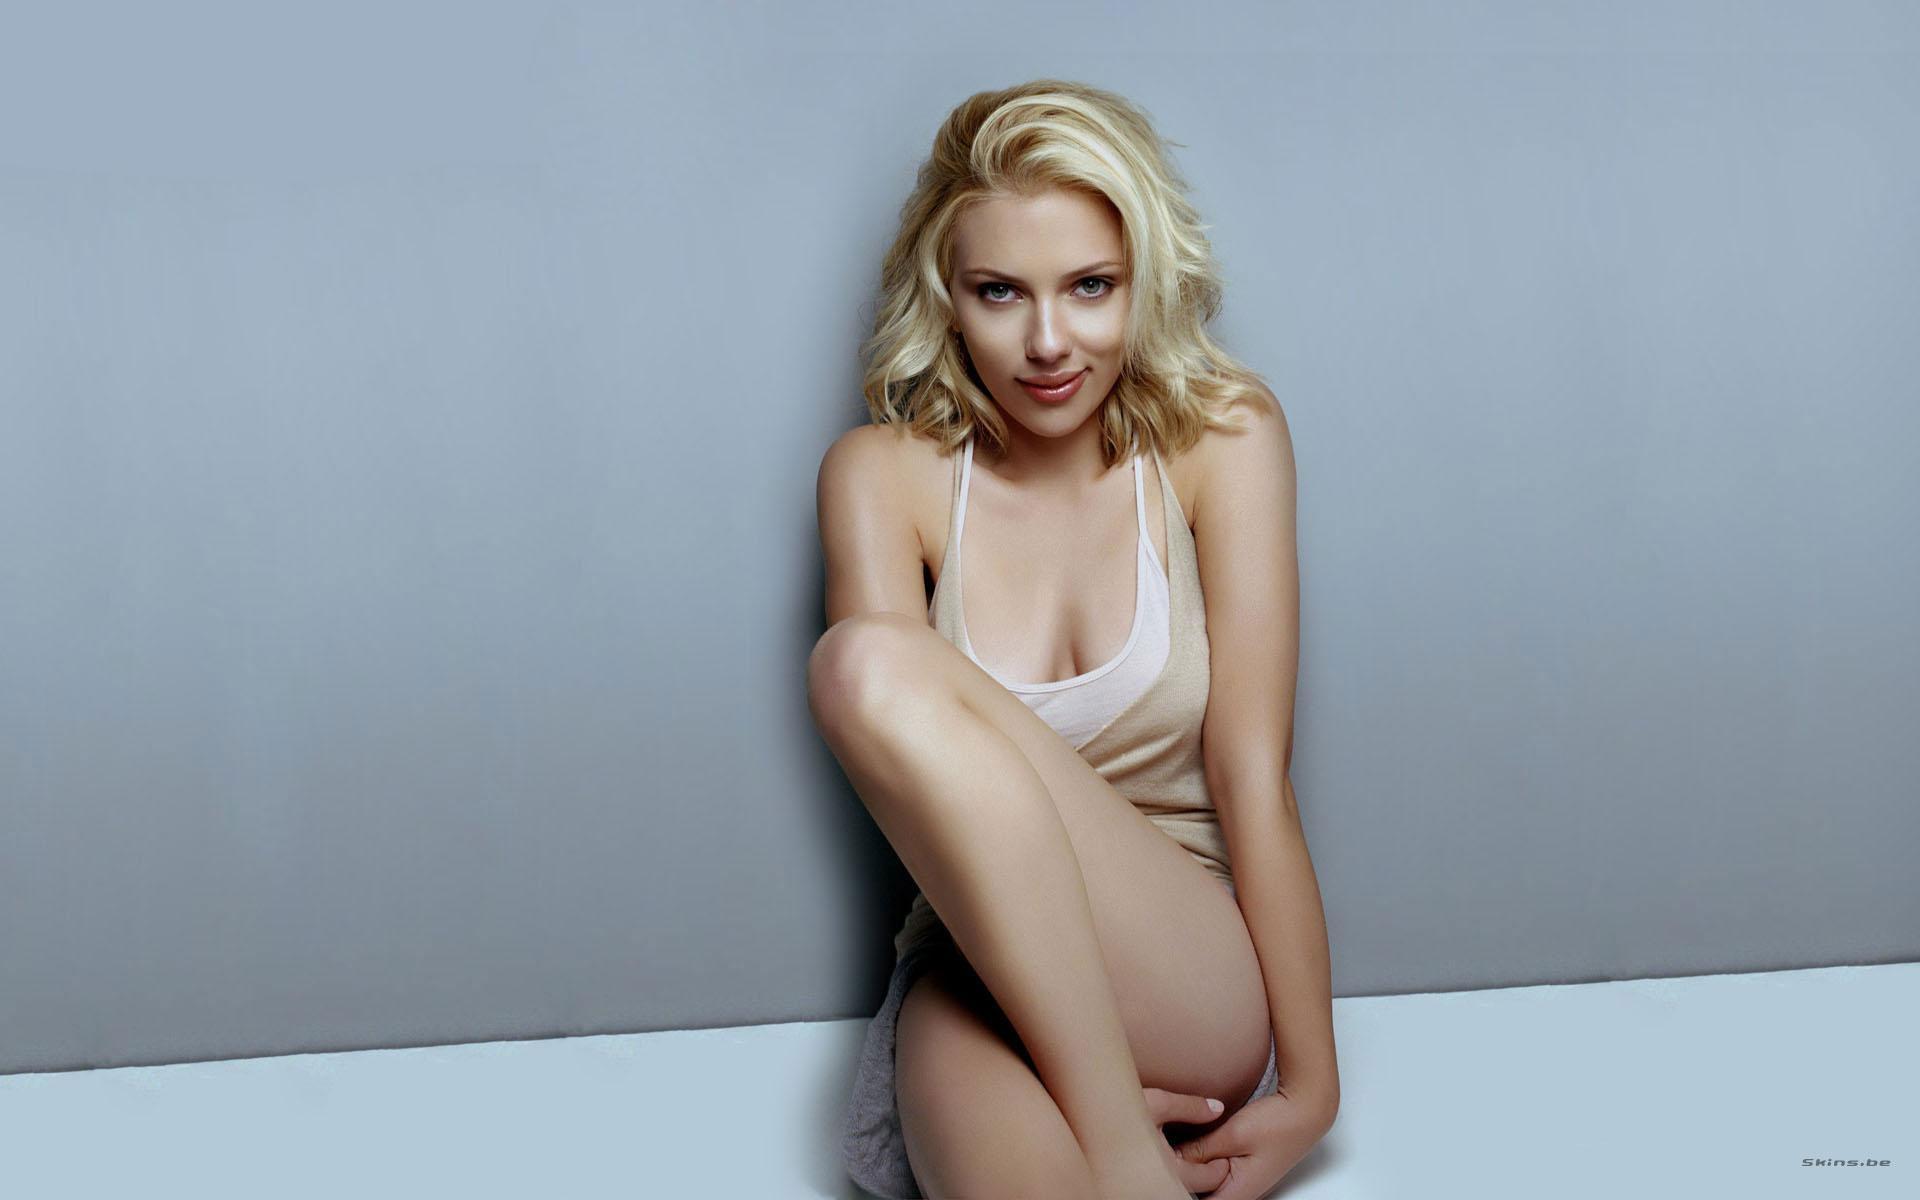 美女明星——Scarlett Johansson[50P] - 男人天堂: 249xx.com/meimei/20150329/65752.html